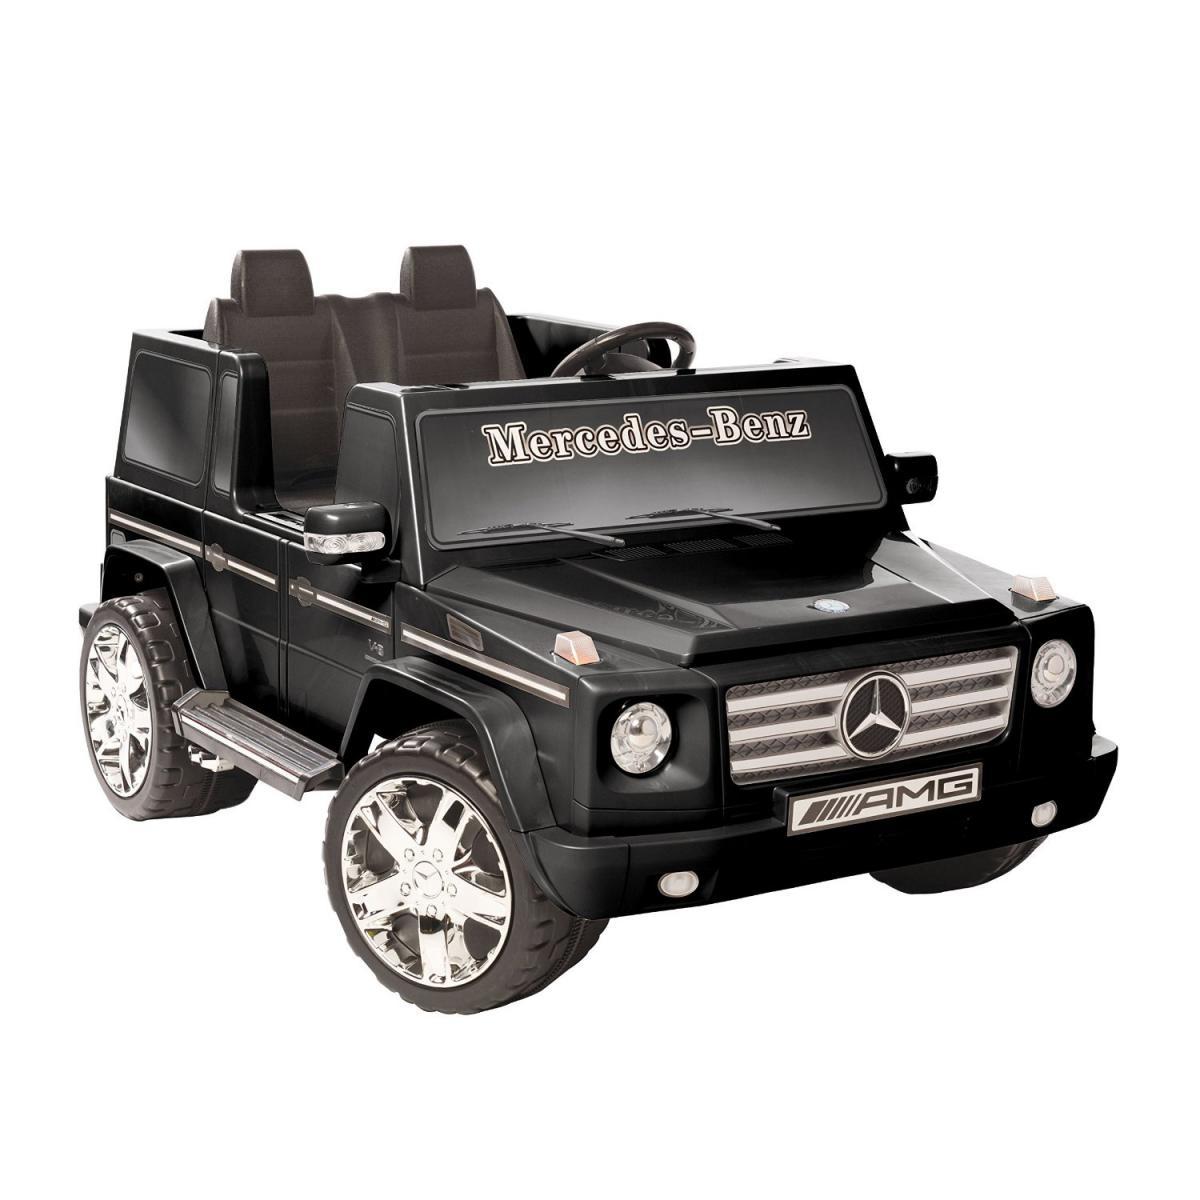 electric vehicles mercedes benz g class 12v black battery ride on toys car kids ebay